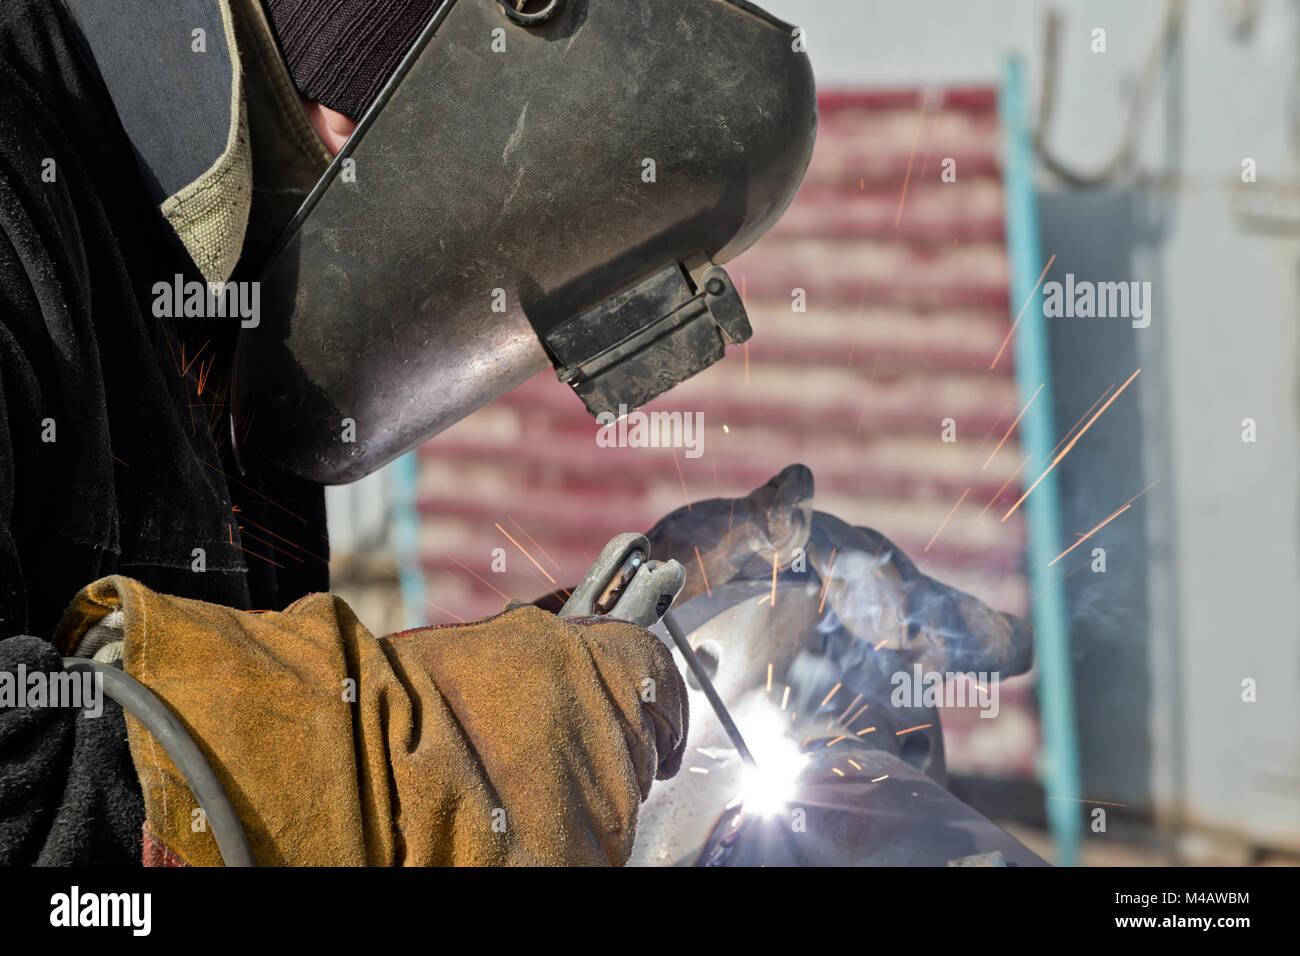 Lavori di saldatura per la produzione di unità e parti di condutture Foto Stock